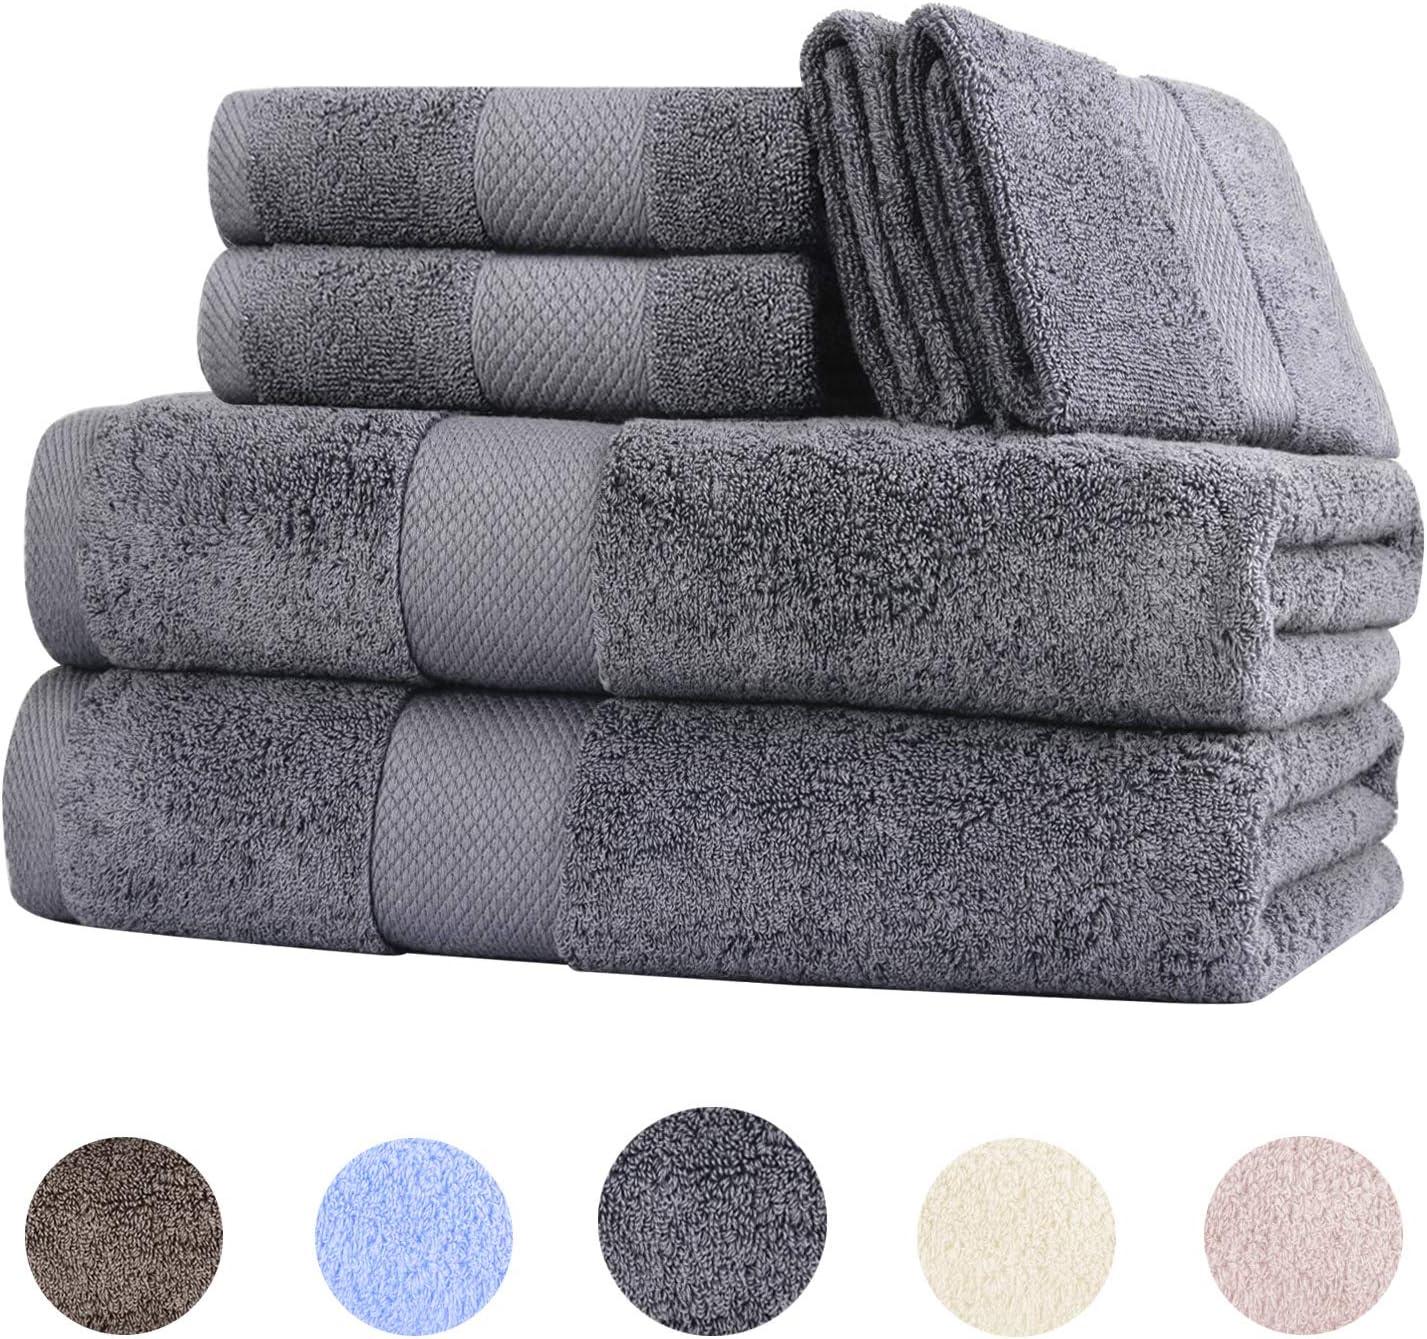 Wonwo 6 Piece Cotton Towel Set